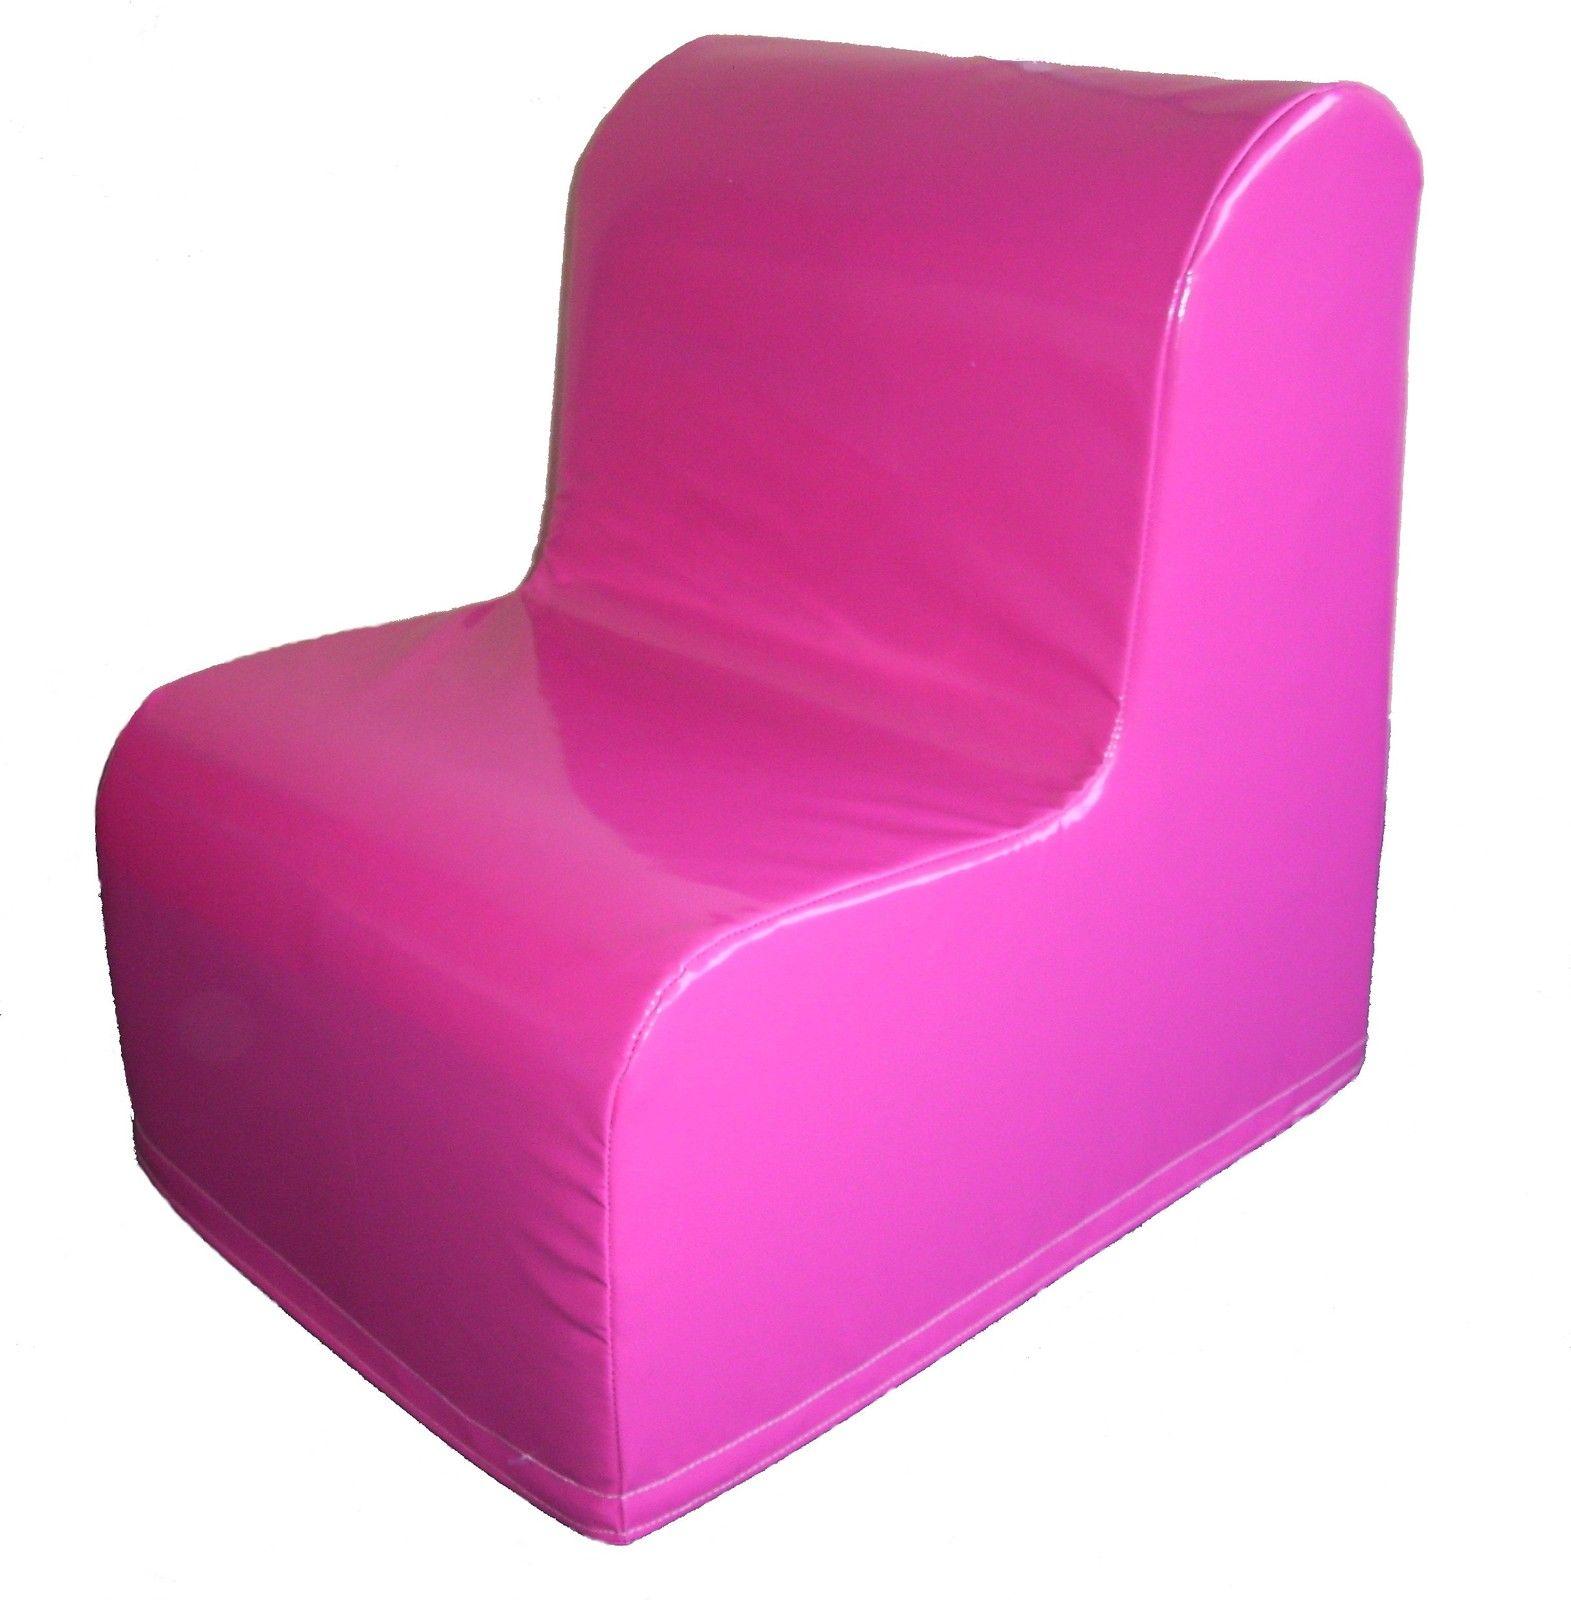 Nursery Furniture Soft Play Kids Modular Chair